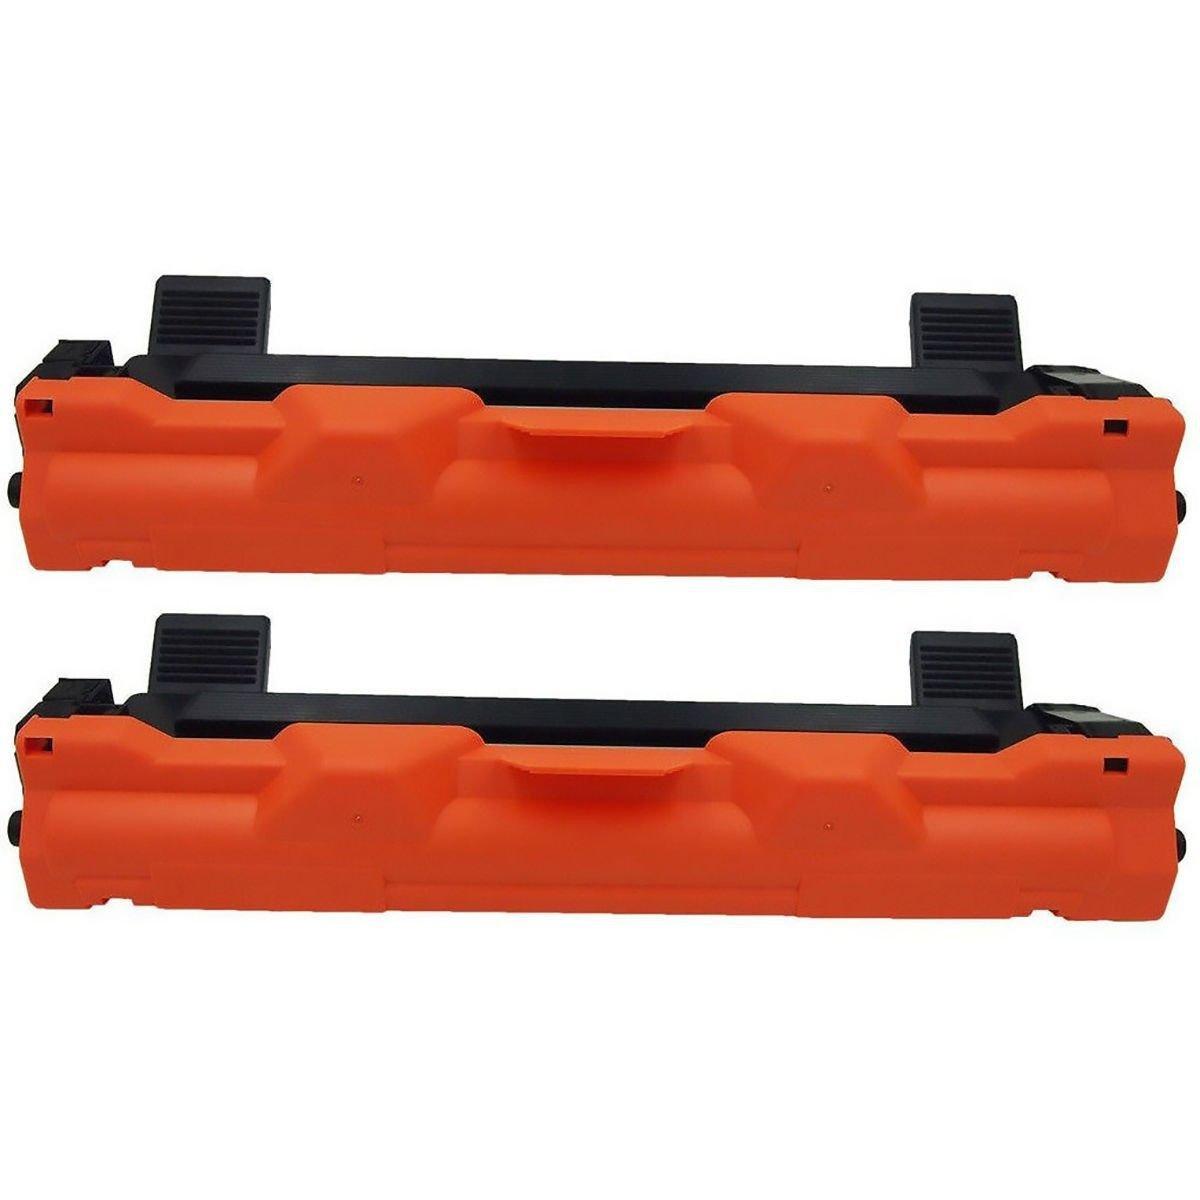 Kit 2 Toner Compatível TN1060 1060 | DCP1602 DCP1512 DCP1617NW HL1112 HL1202 HL1212W